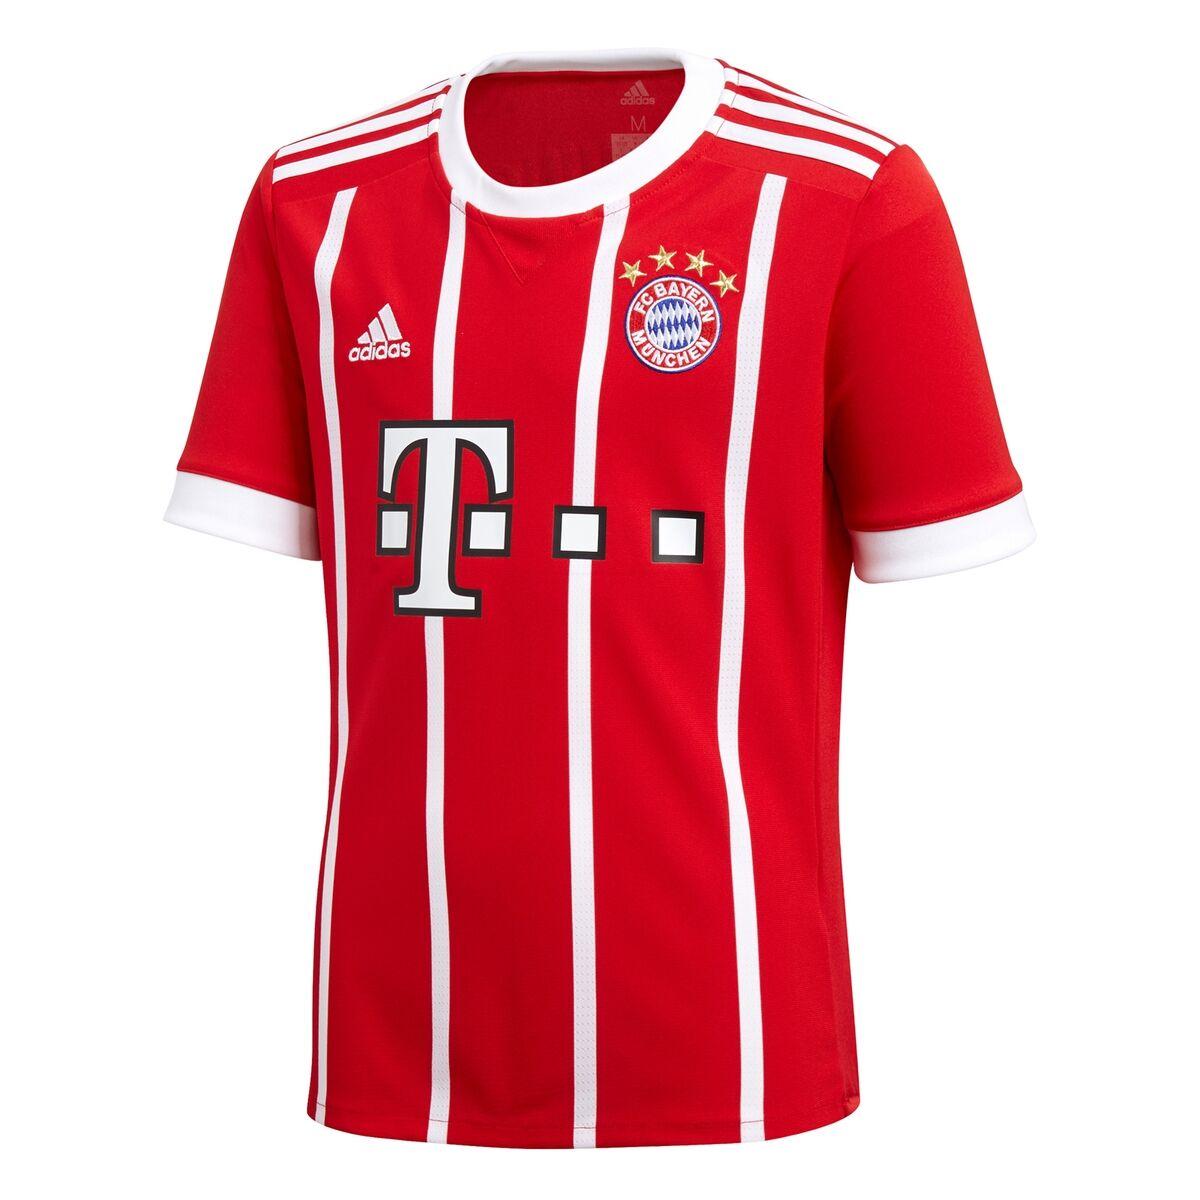 adidas Originals Maillot FC Bayern Munich Domicile Replica